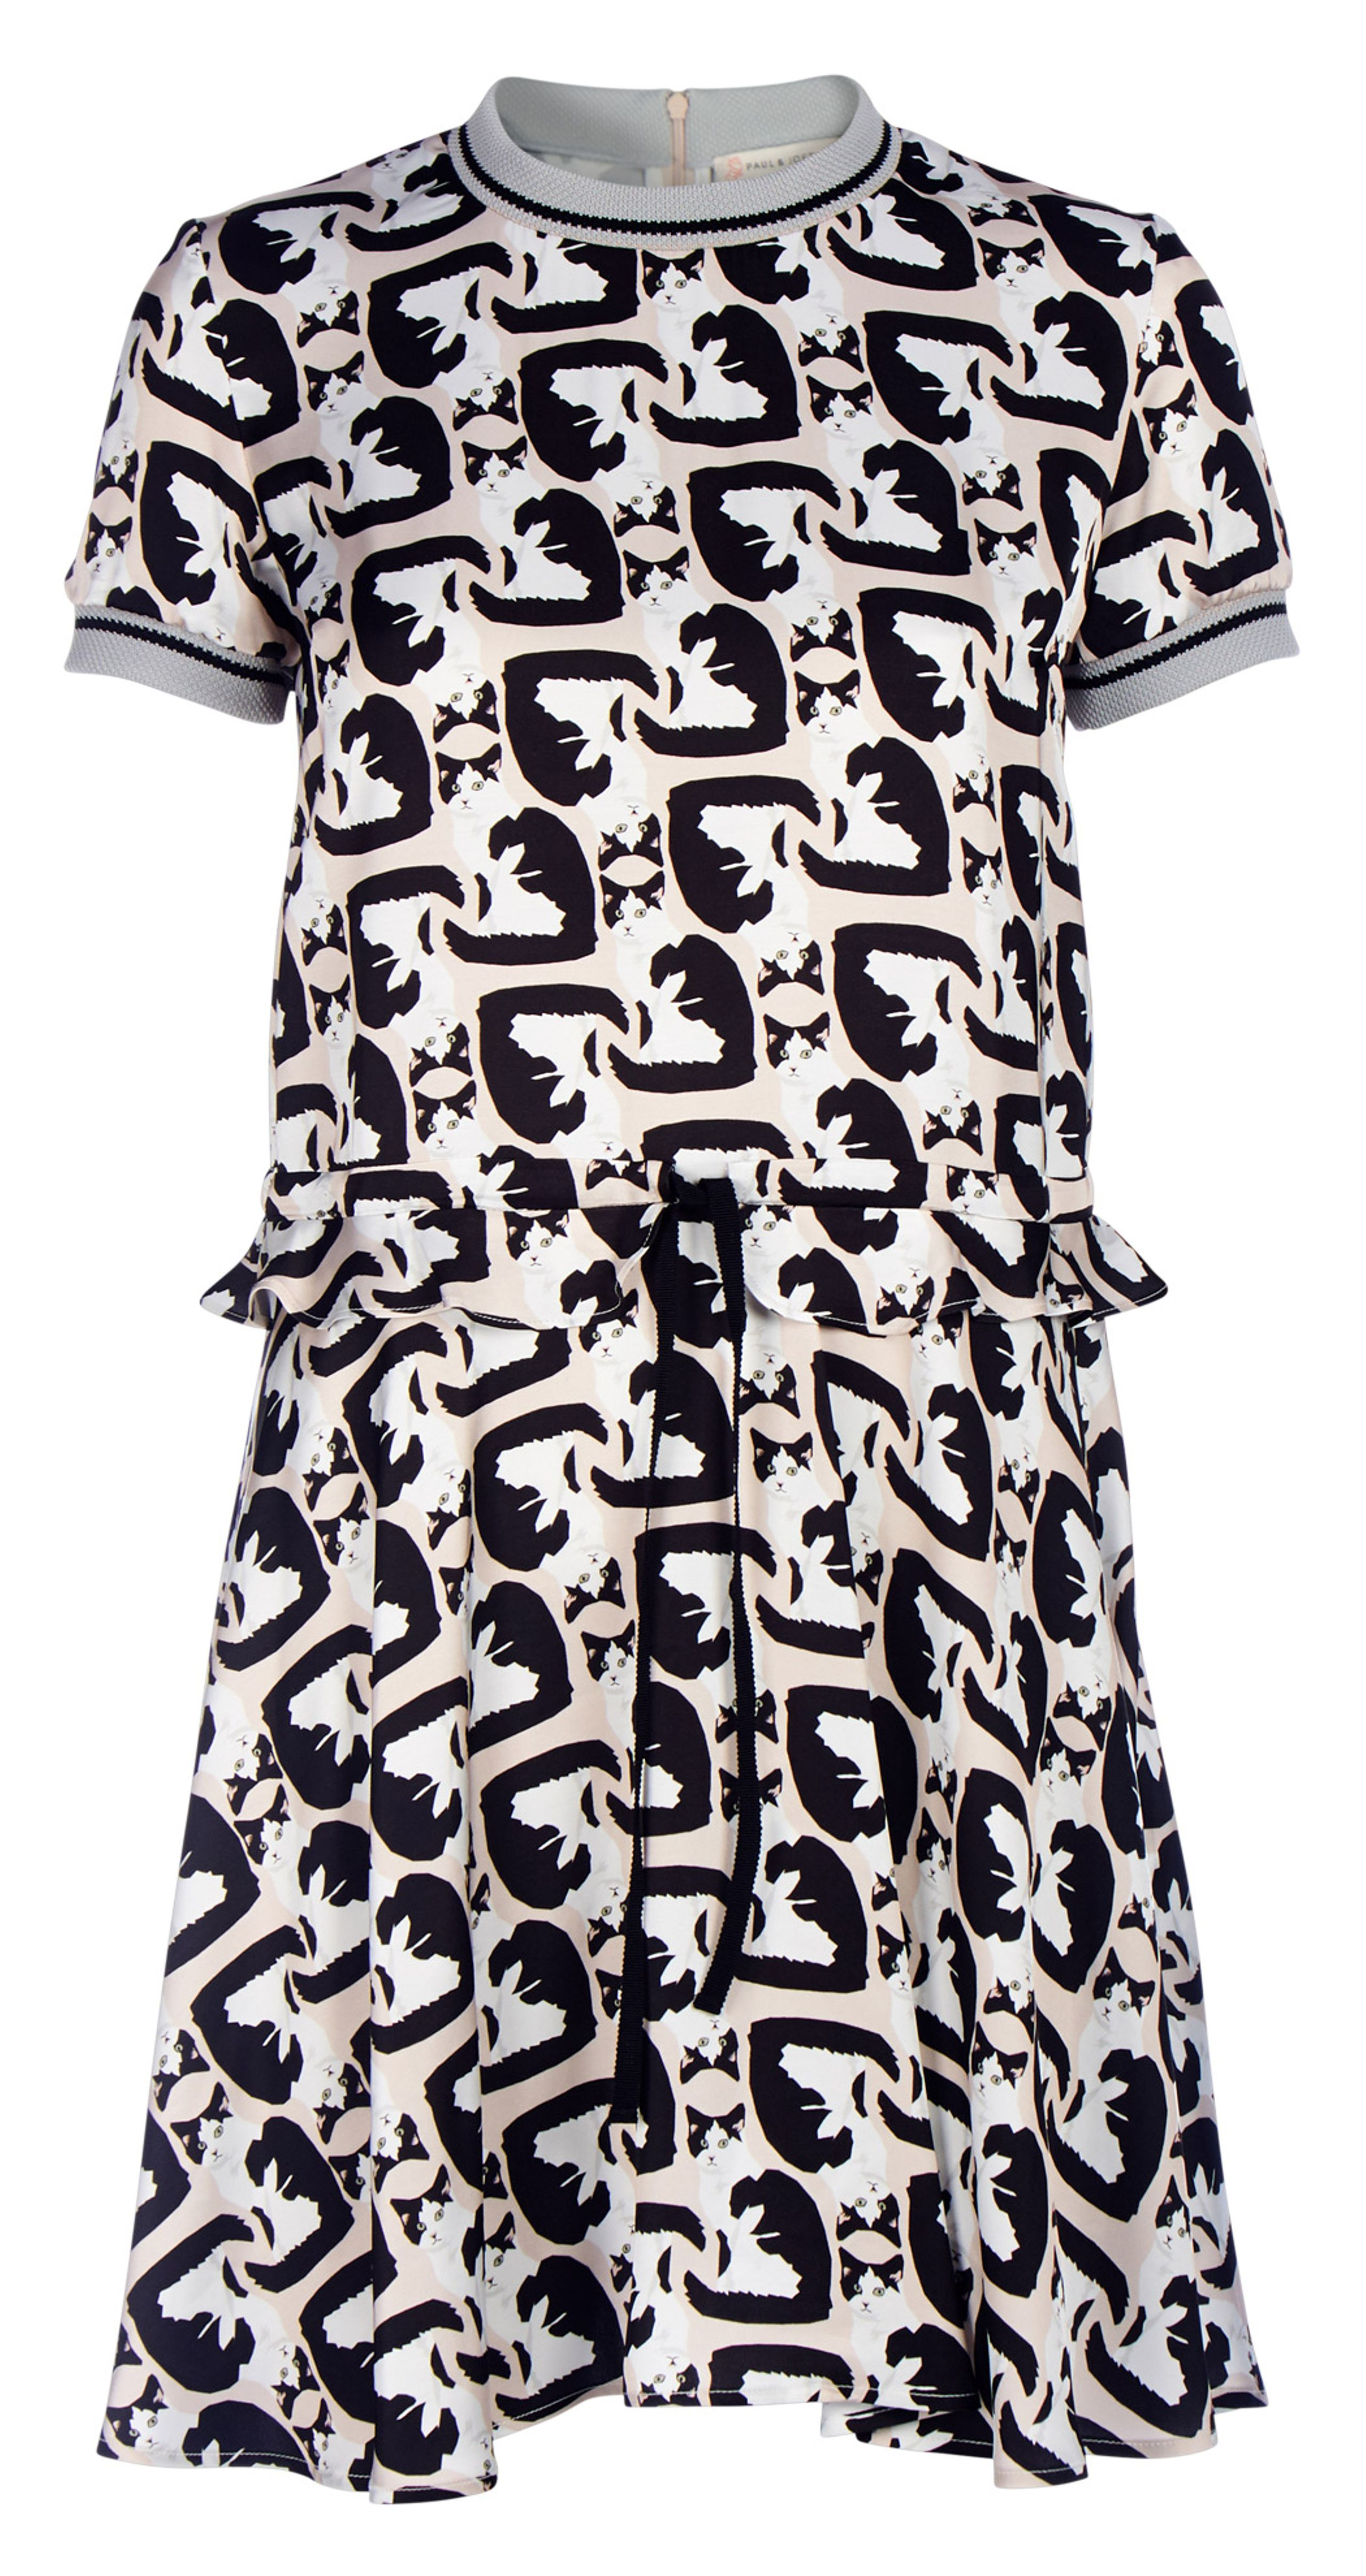 Paul Sister Joe Bambina Dress amp; 7qWcBn4wP